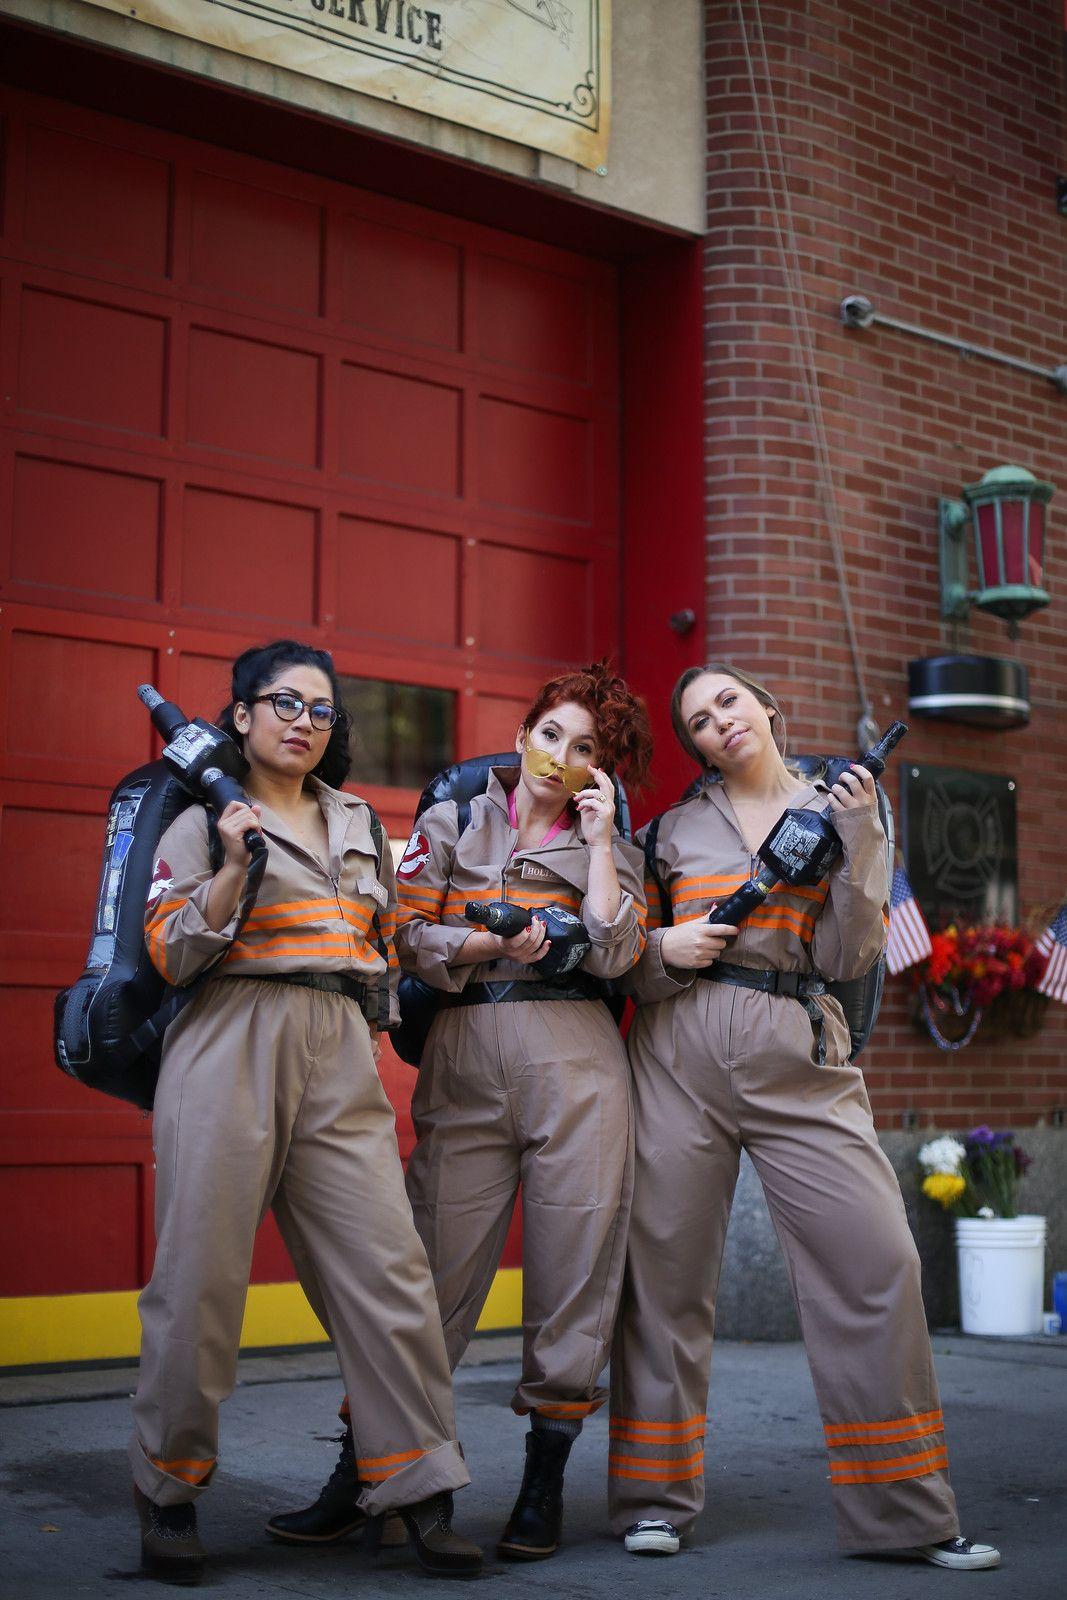 13.10.2020· 25 punny halloween costumes. الكاحل عجل اللطف Halloween Costume Themes Elopeislandbeauty Com